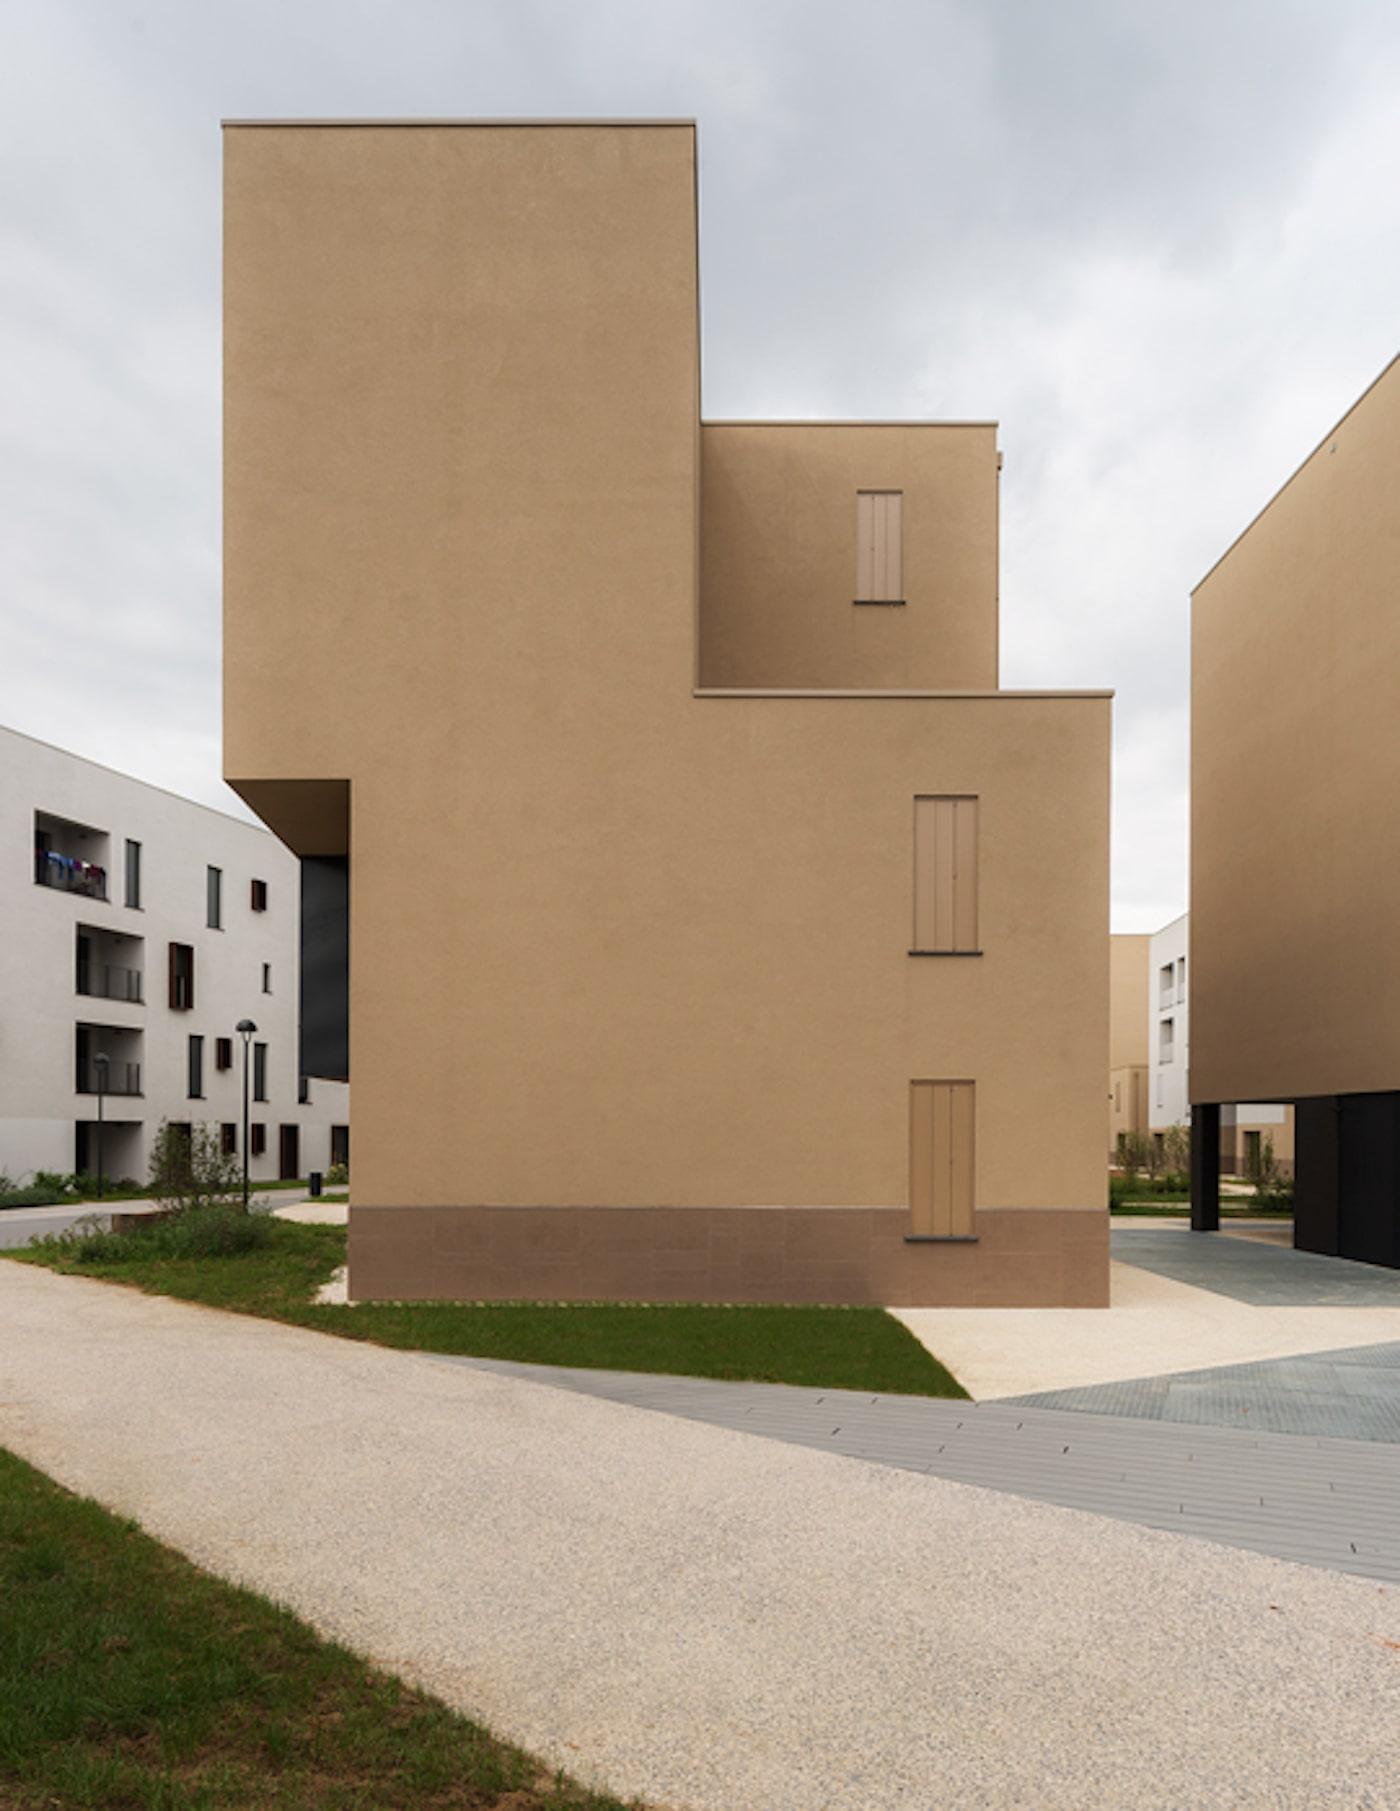 Figino apartments with timber facade